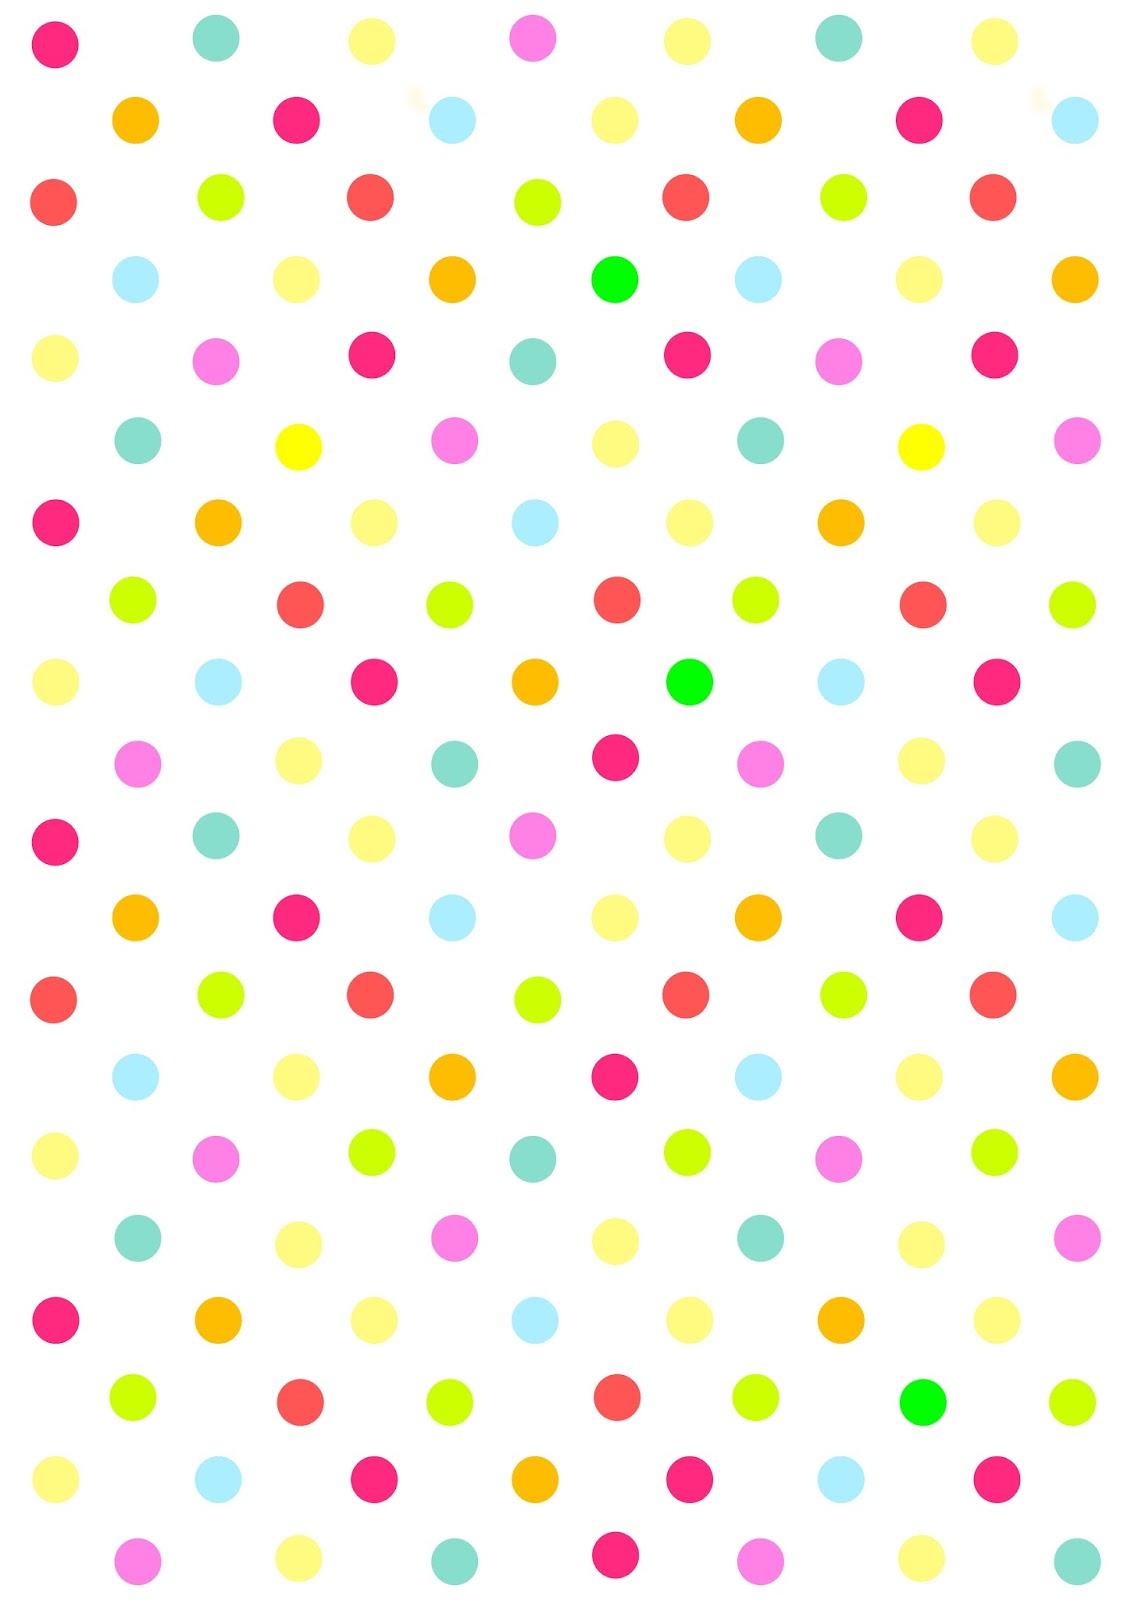 7 Images of Free Printable Polka Dot Pattern Paper